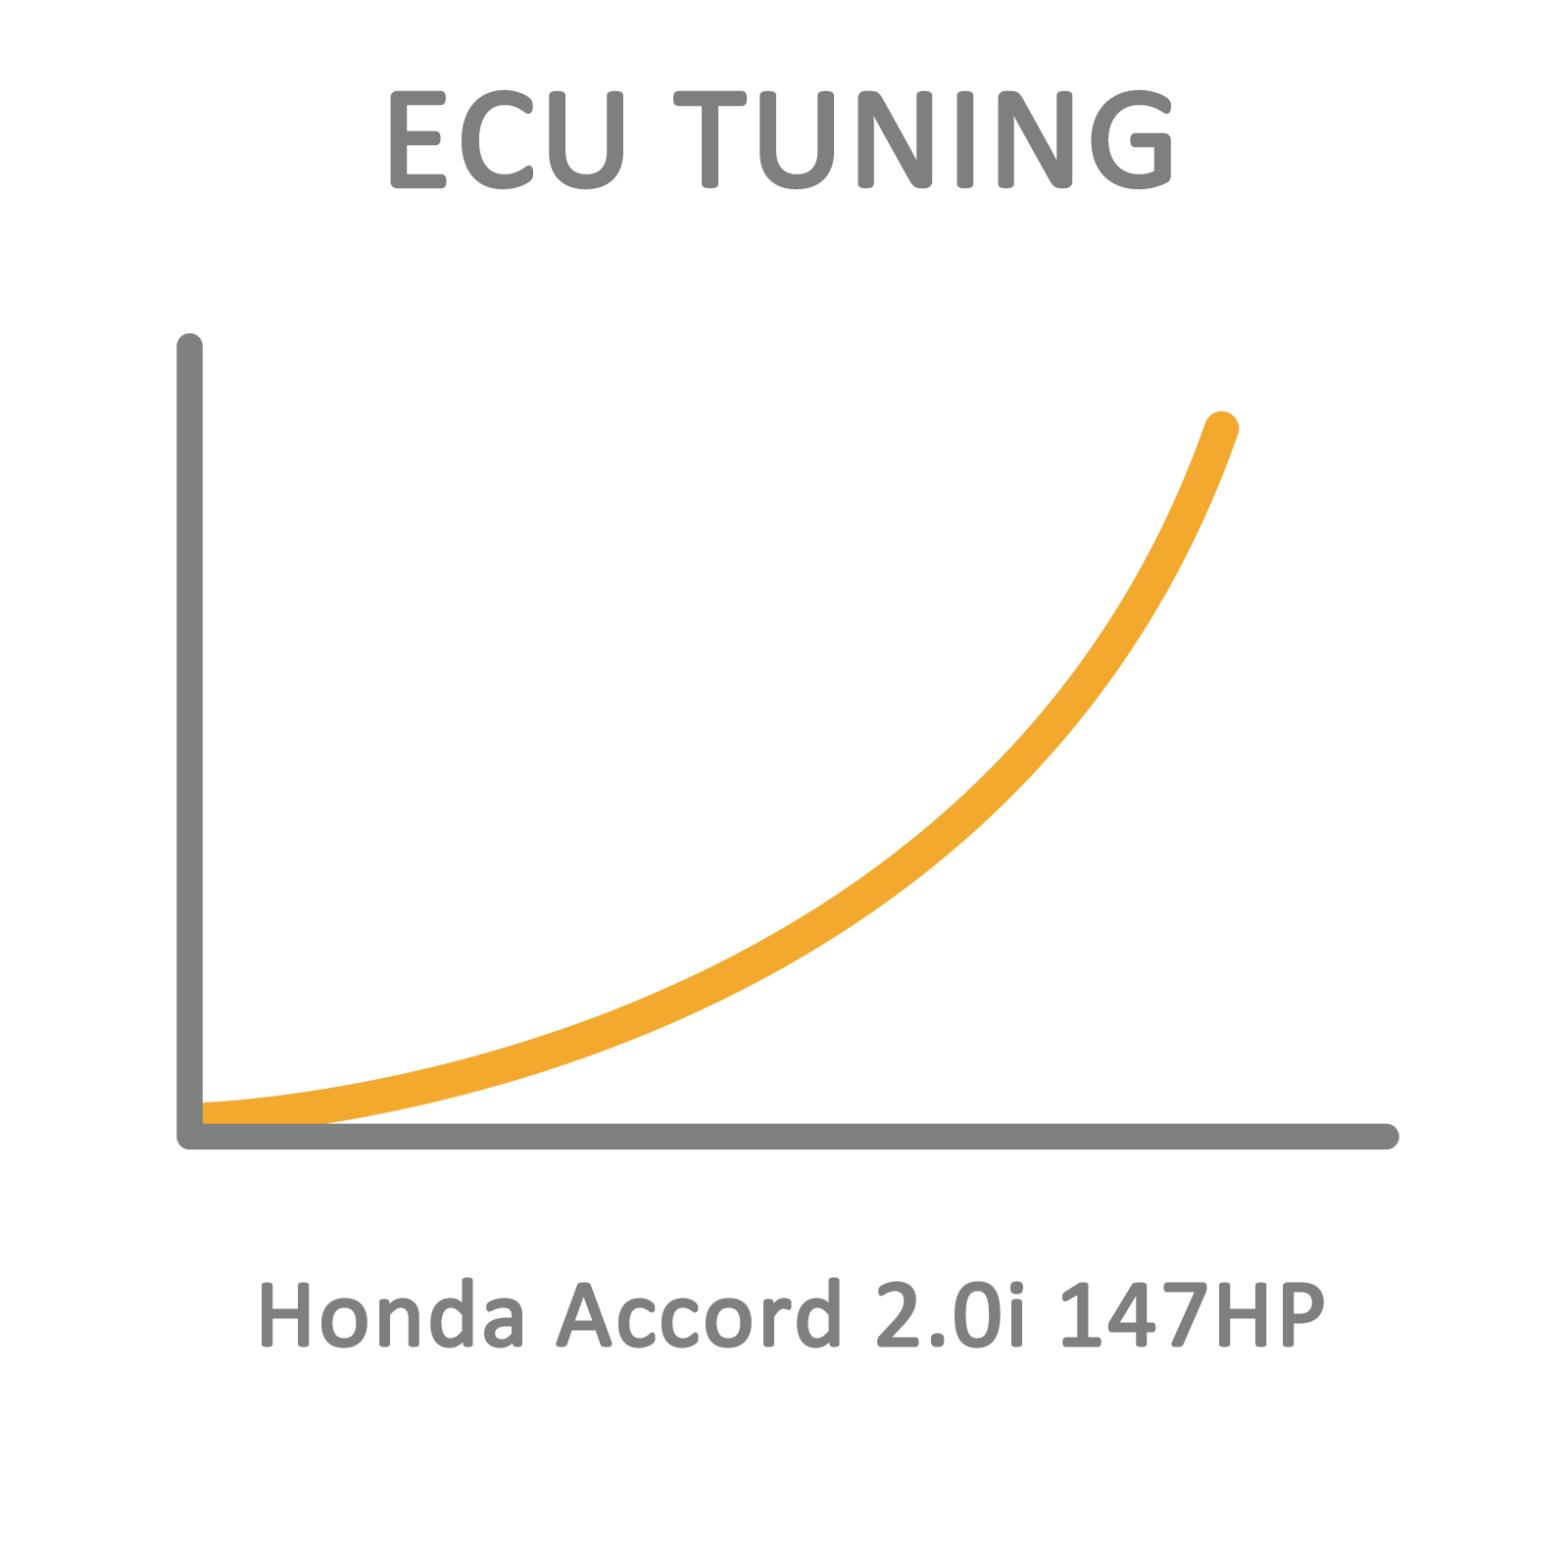 Honda Accord 2.0i 147HP ECU Tuning Remapping Programming